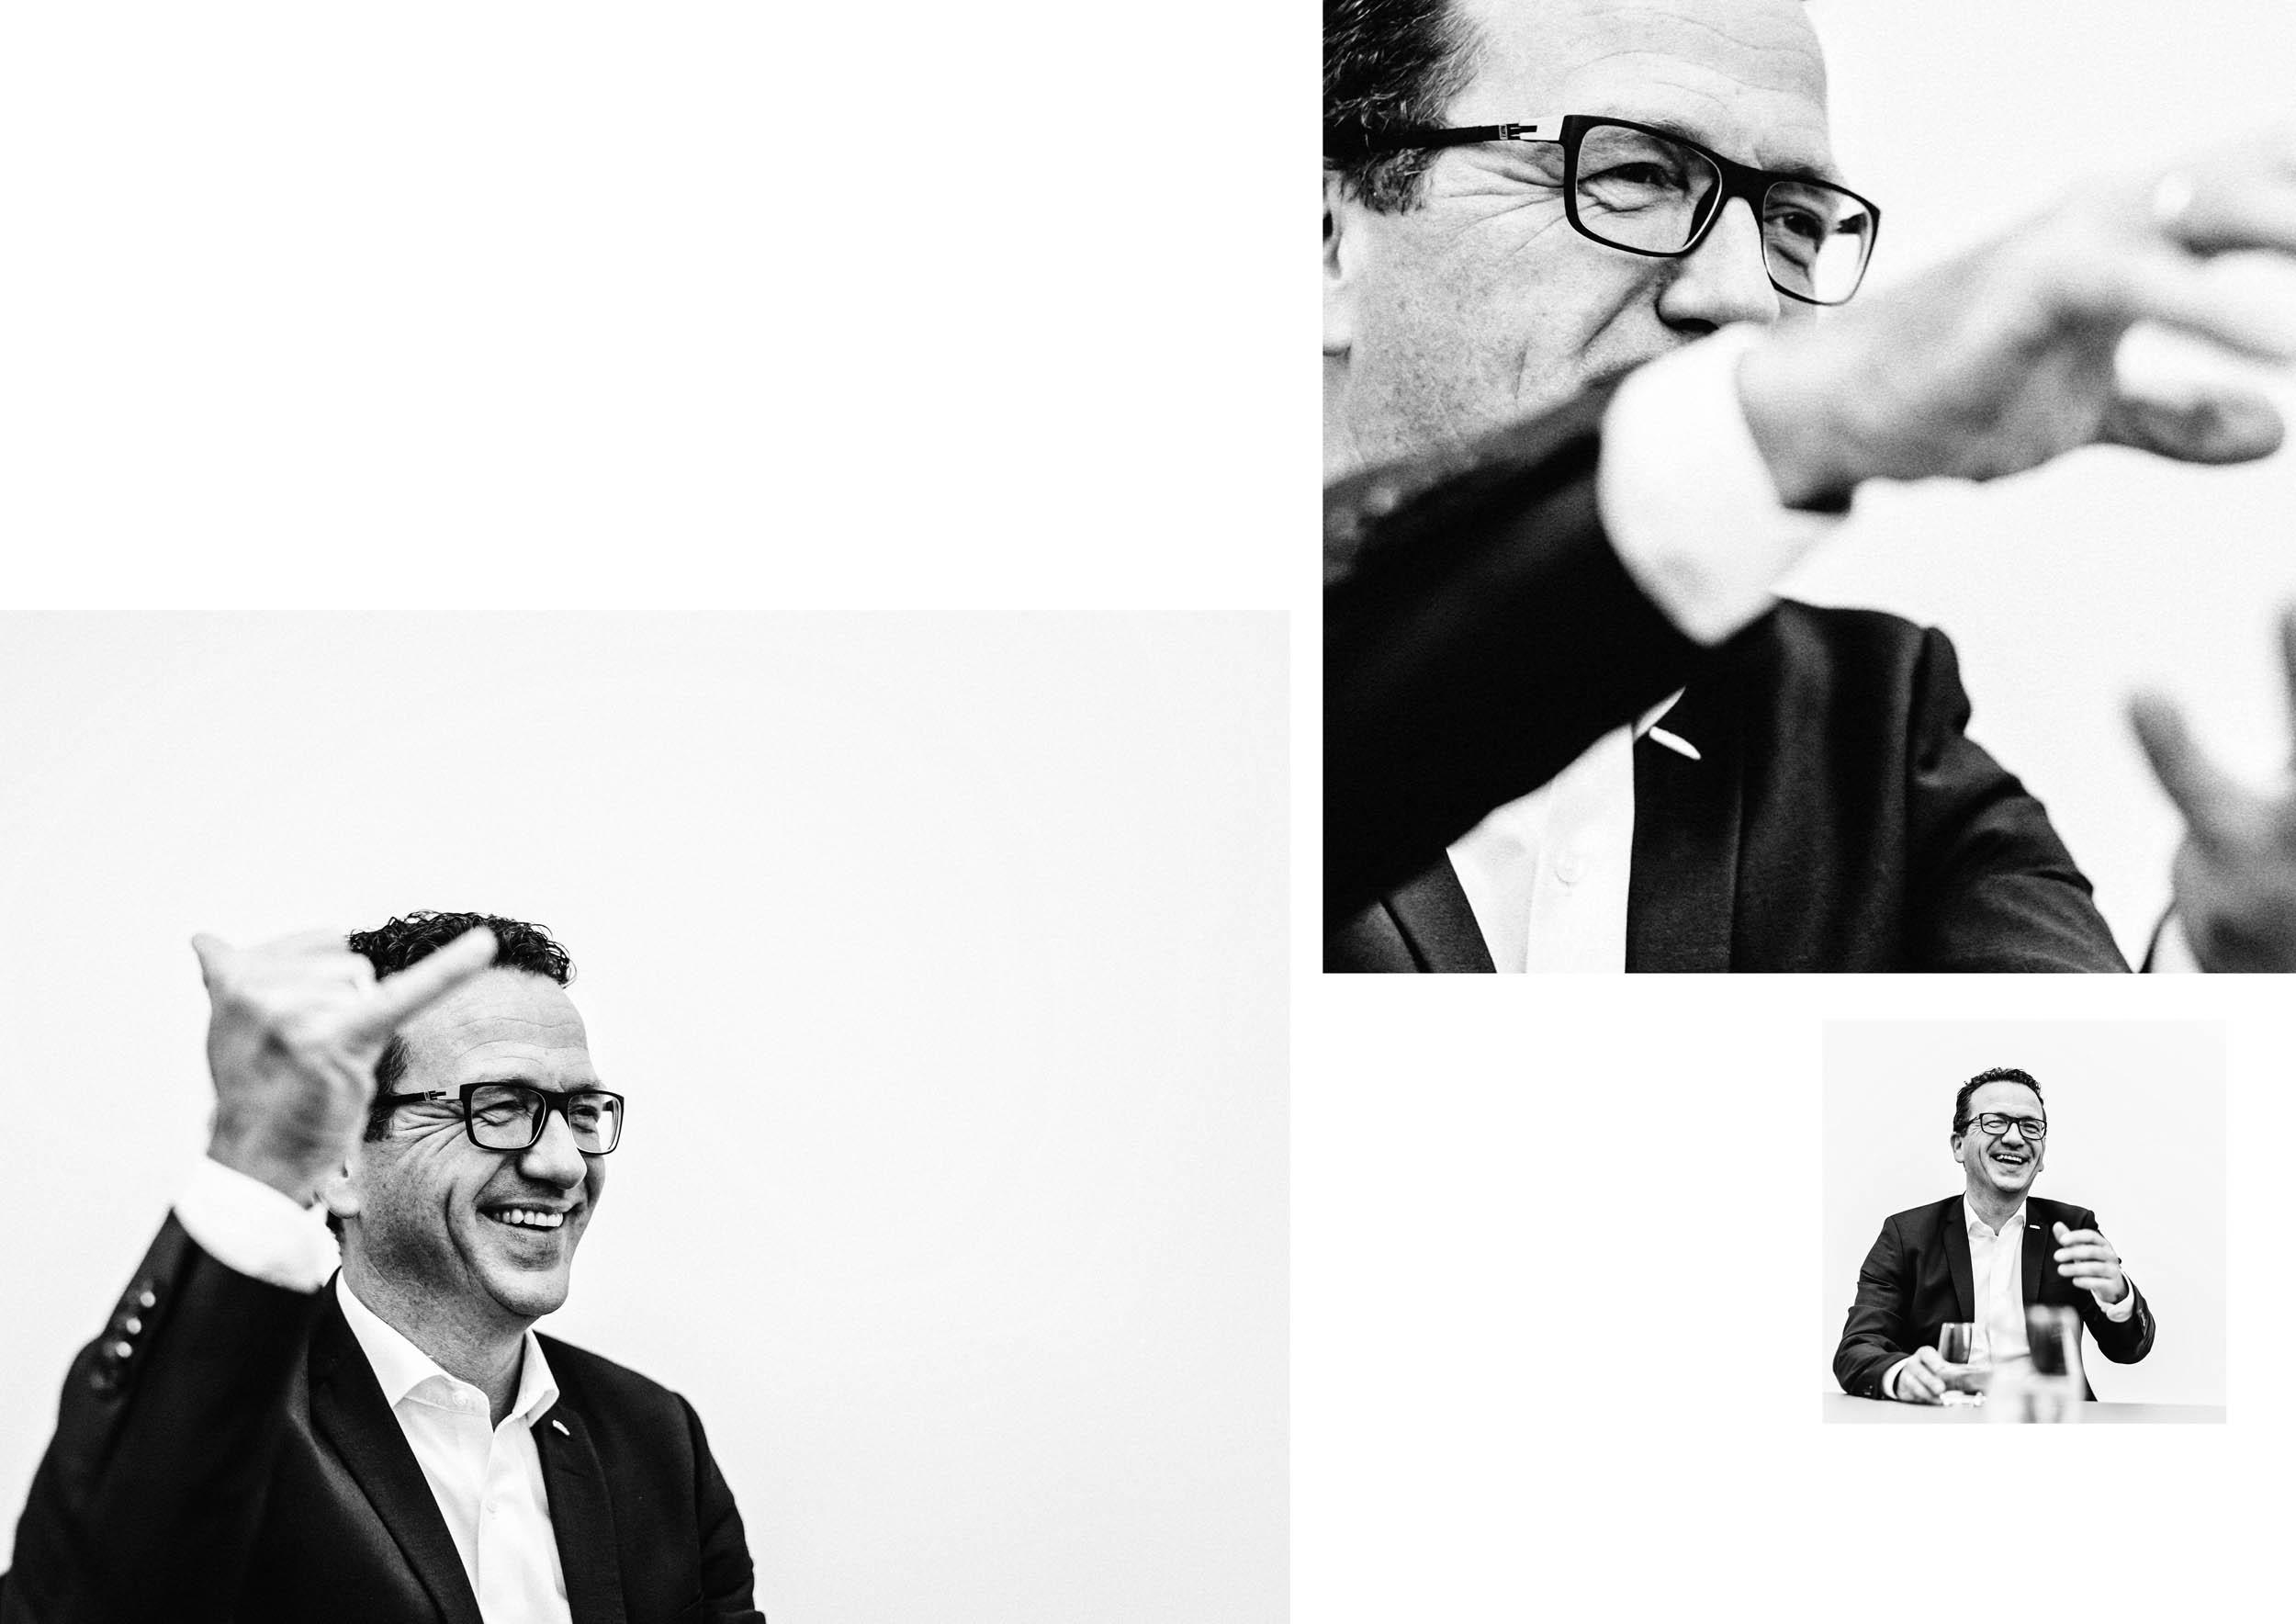 2018_SeifertUebler_schueller_kuechen_corporate_portrait_industrial_photography_005.jpg